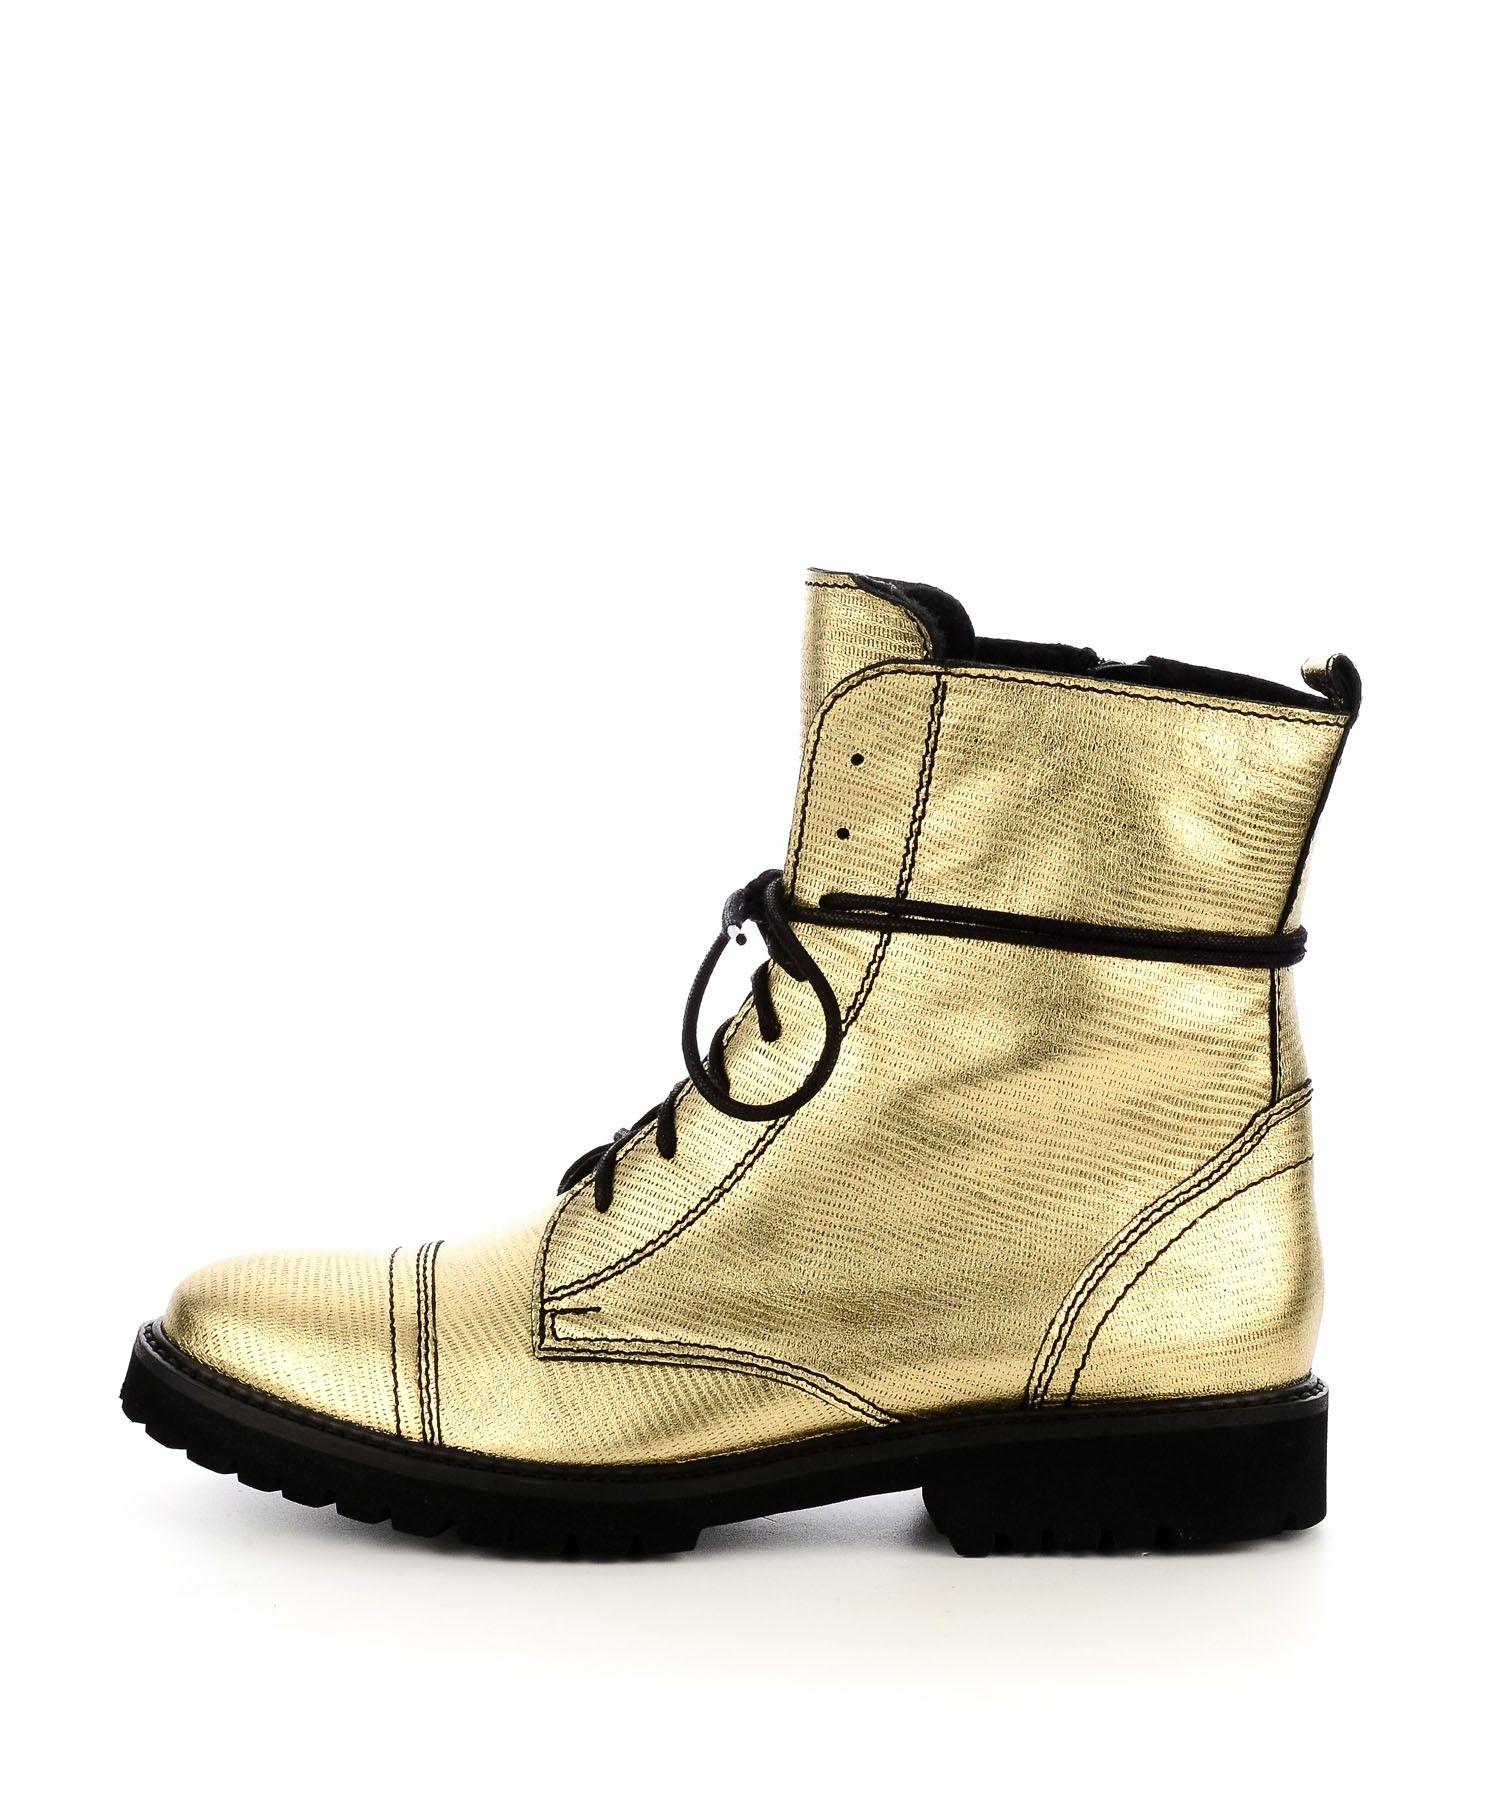 Zlote Sznurowane Botki Za Kostke Botki Kolekcja Damska Combat Boots Boots Shoes